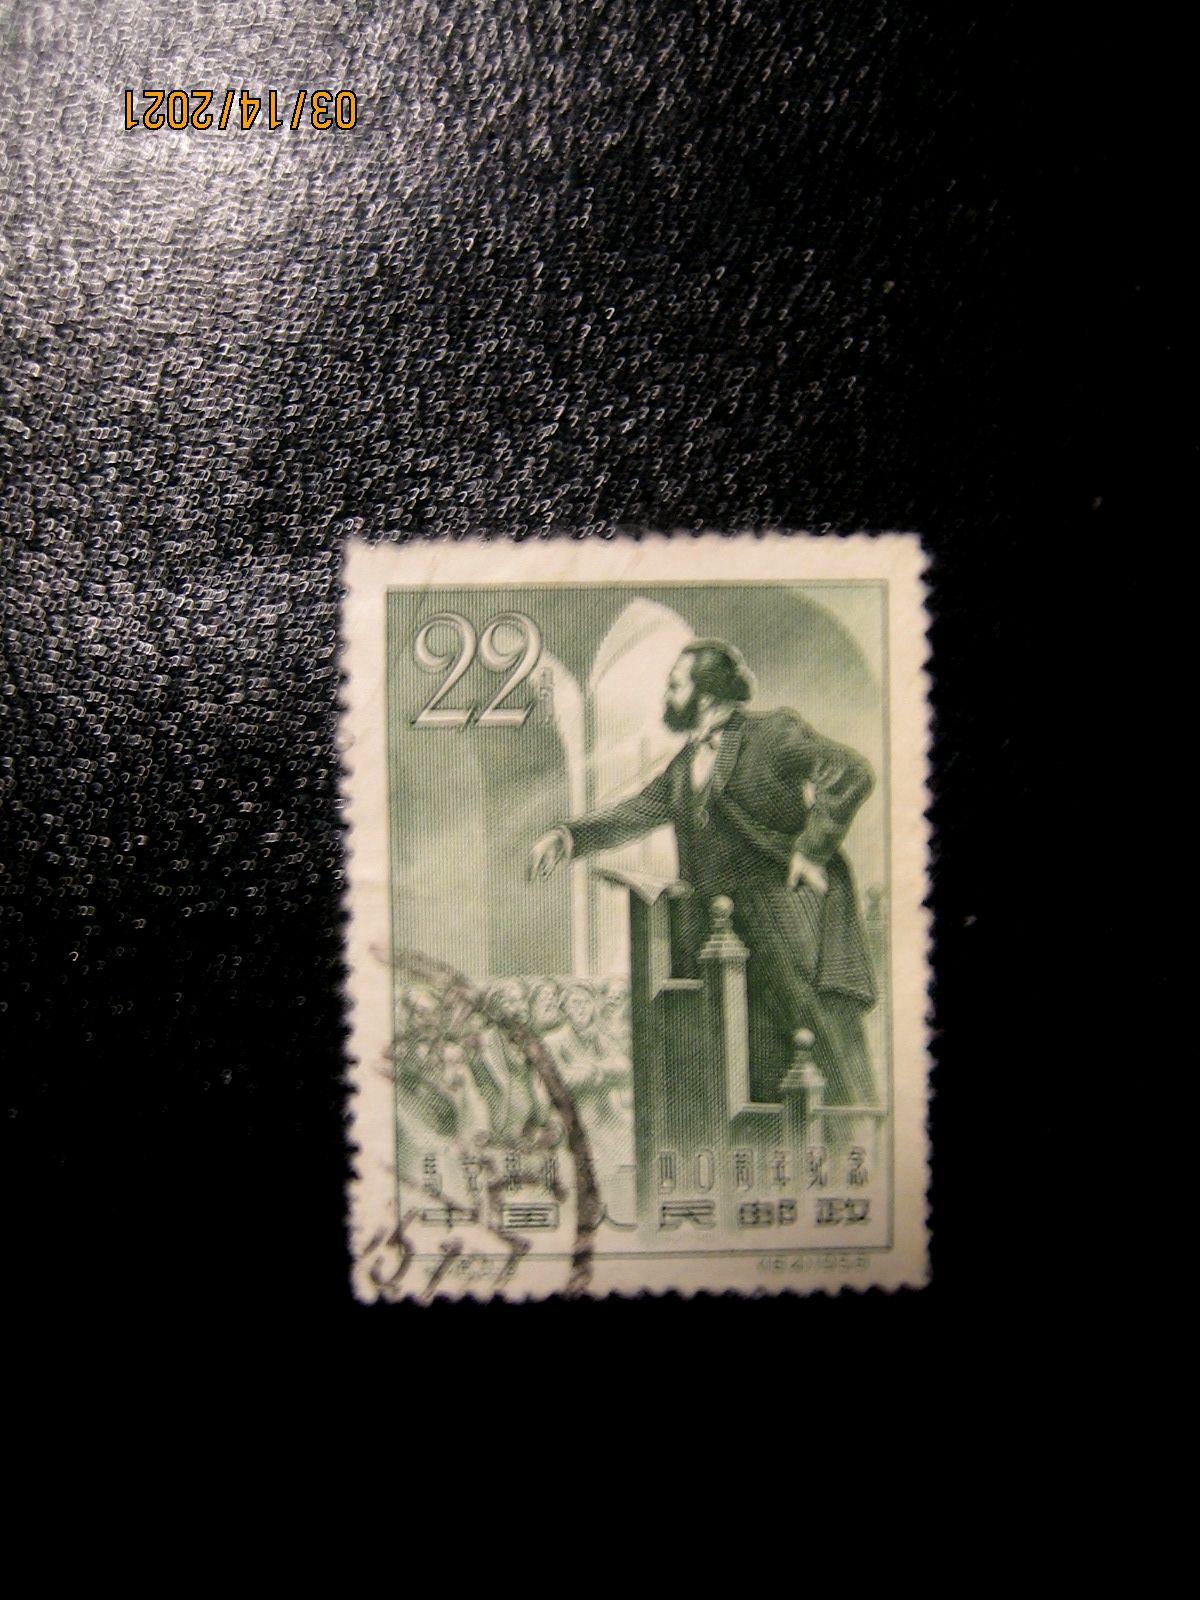 КНР Китай 1958-05-05 Карл Маркс выступает на трибуне, номинал — 22  Chinese renminbi fēn, Mi:CN 374, Sn:CN 346, Yt:CN 1132, Sg:CN 1751